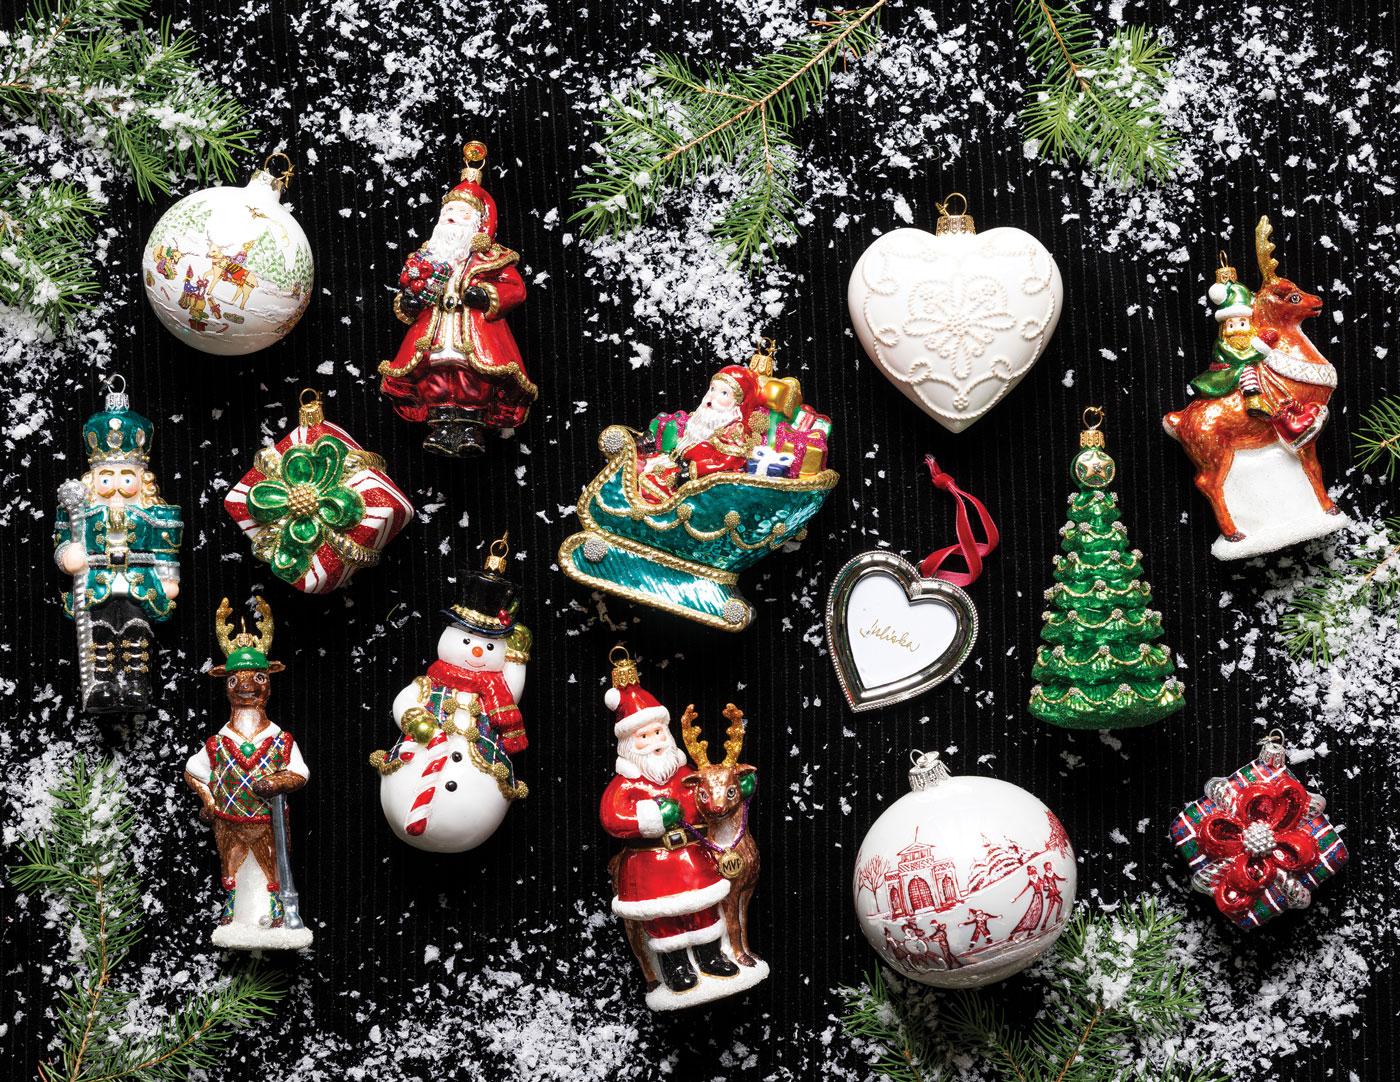 juliska-ornaments.jpg